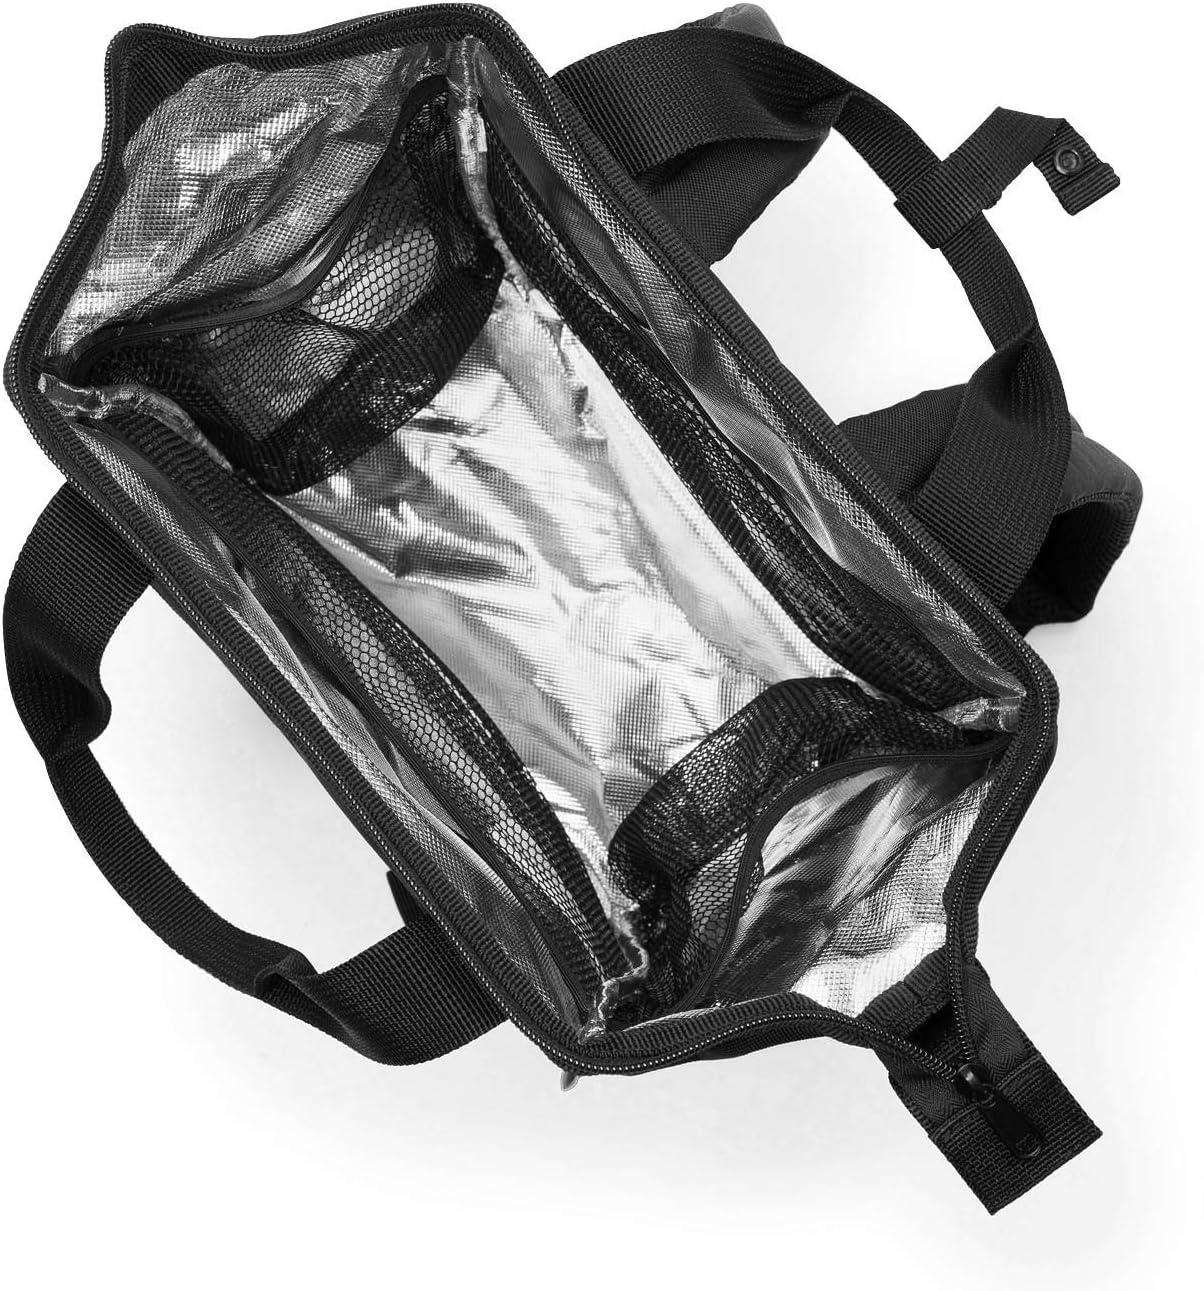 Black Reisenthel Allrounder R iso Sac /à Dos Loisir Noir 12 liters 40 cm